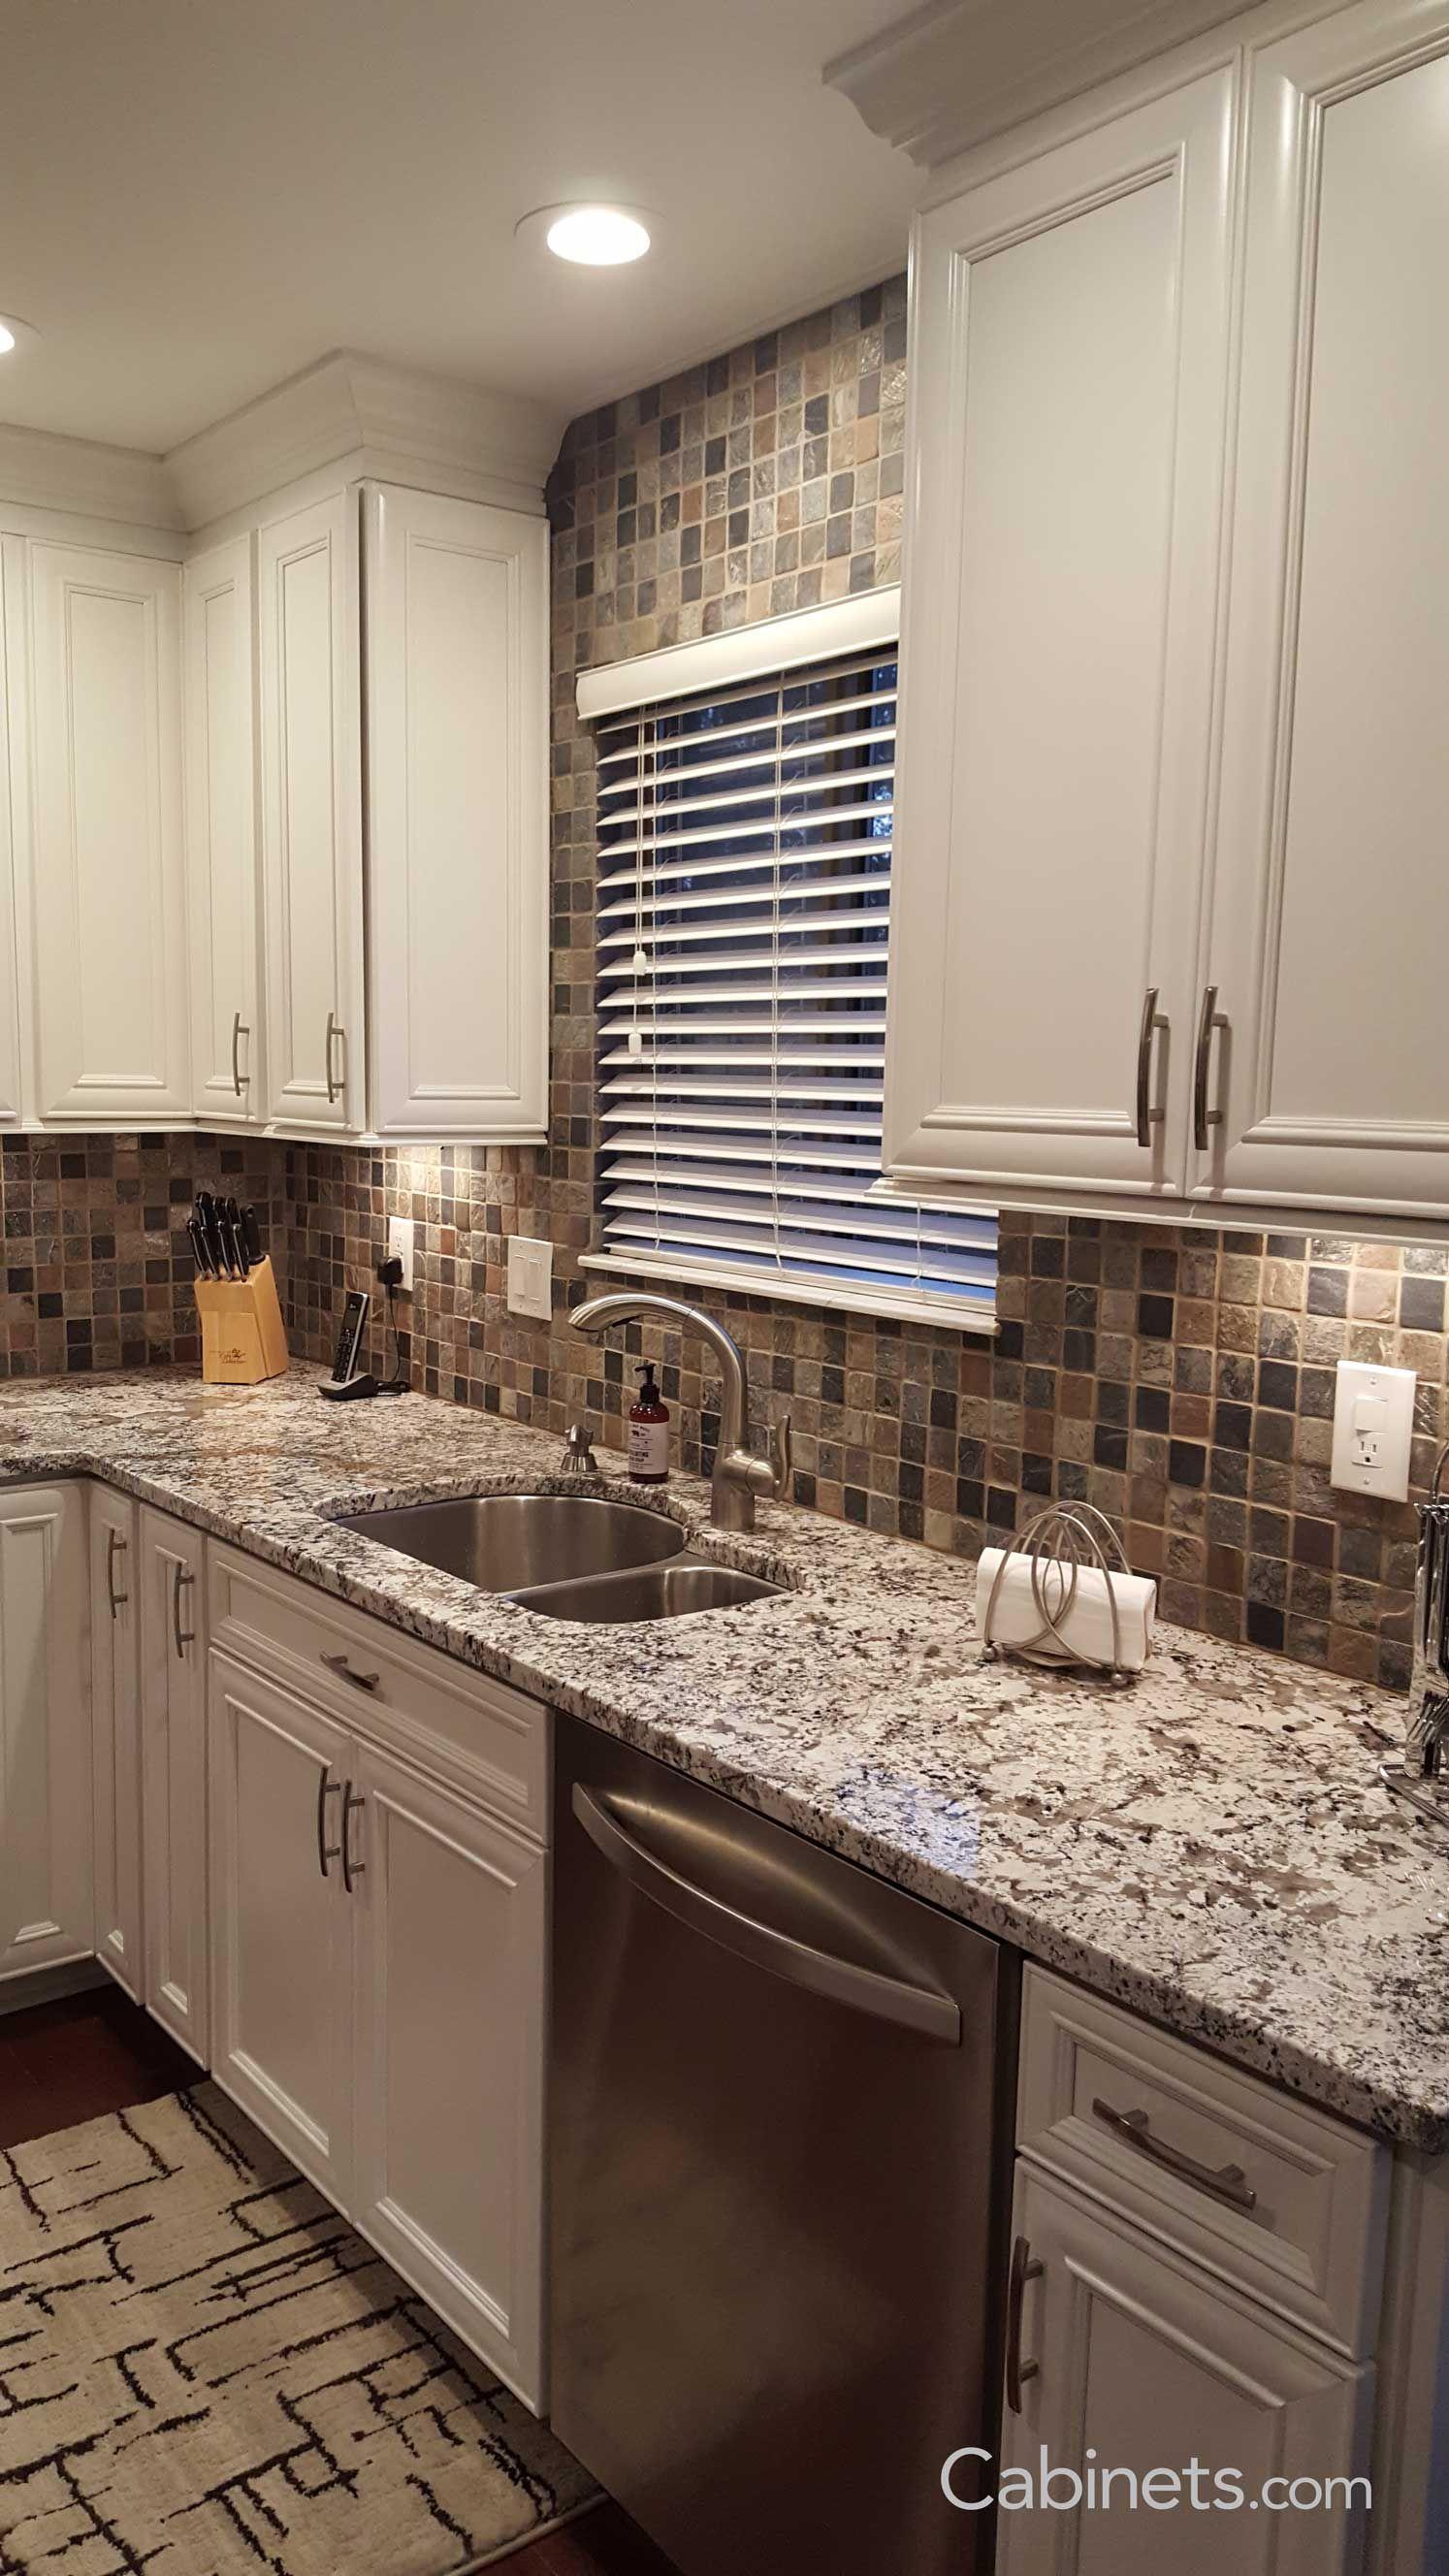 Backsplashes Backsplashideas Backsplash Kitchen White Cabinets